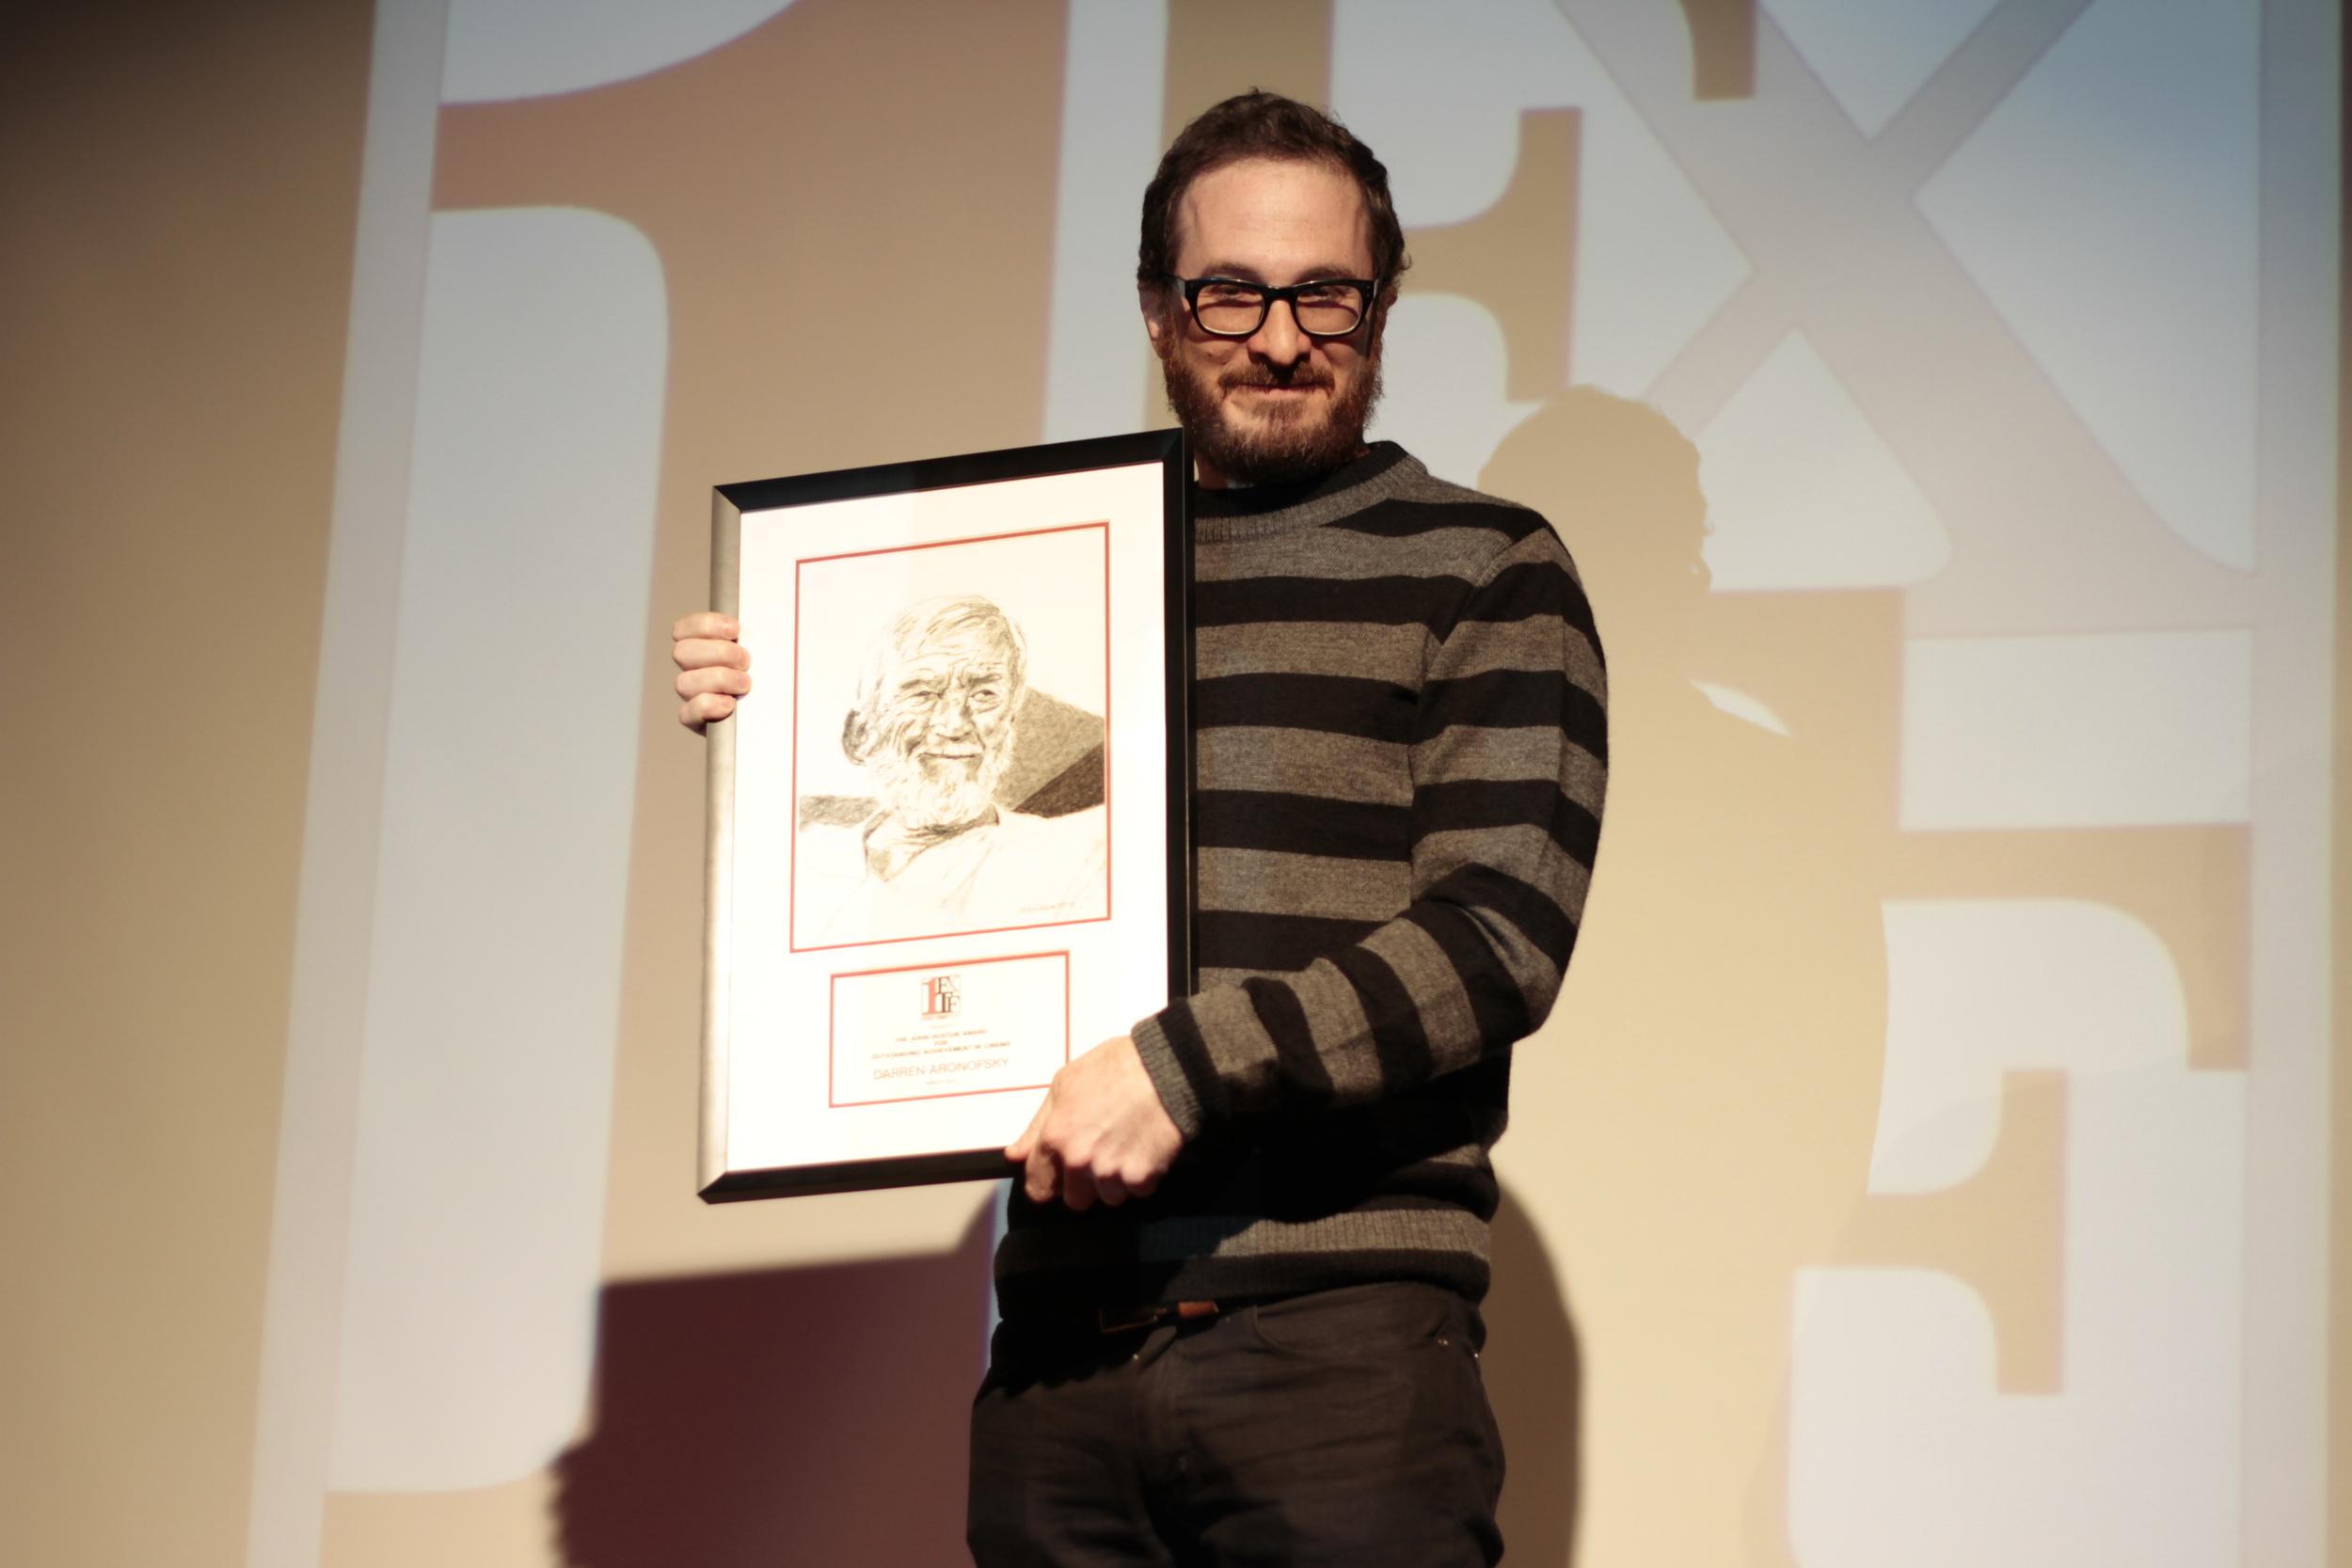 2013 John Huston Award Honoree, Darren Aronofsky